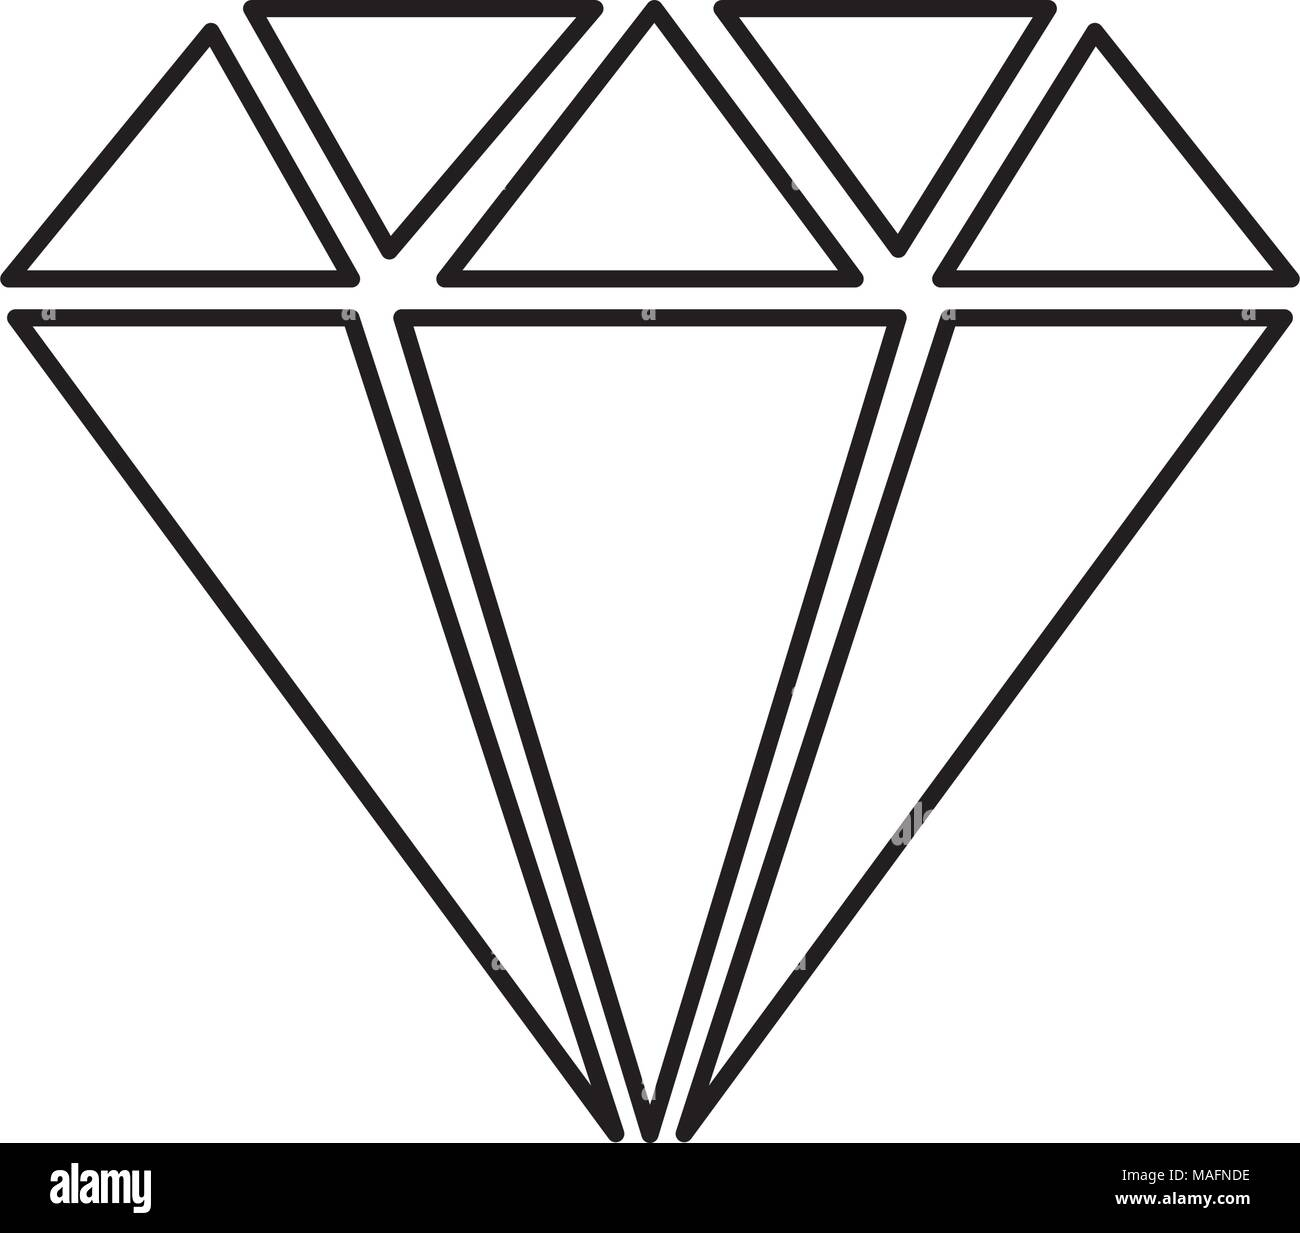 diamond gem isolated icon - Stock Image